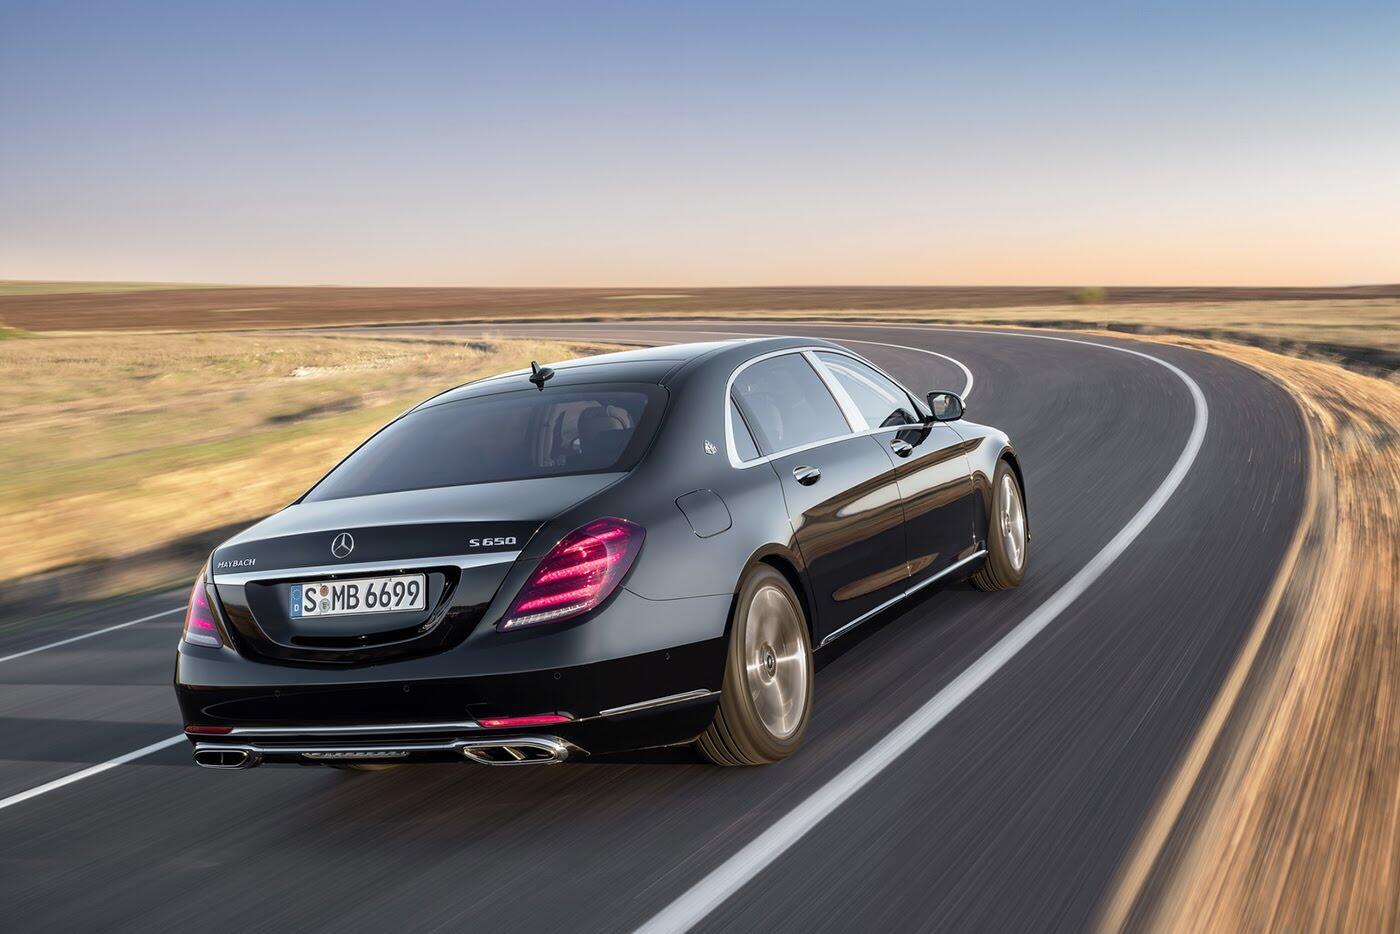 Ảnh chi tiết Mercedes-Benz S-Class 2018 - Hình 3